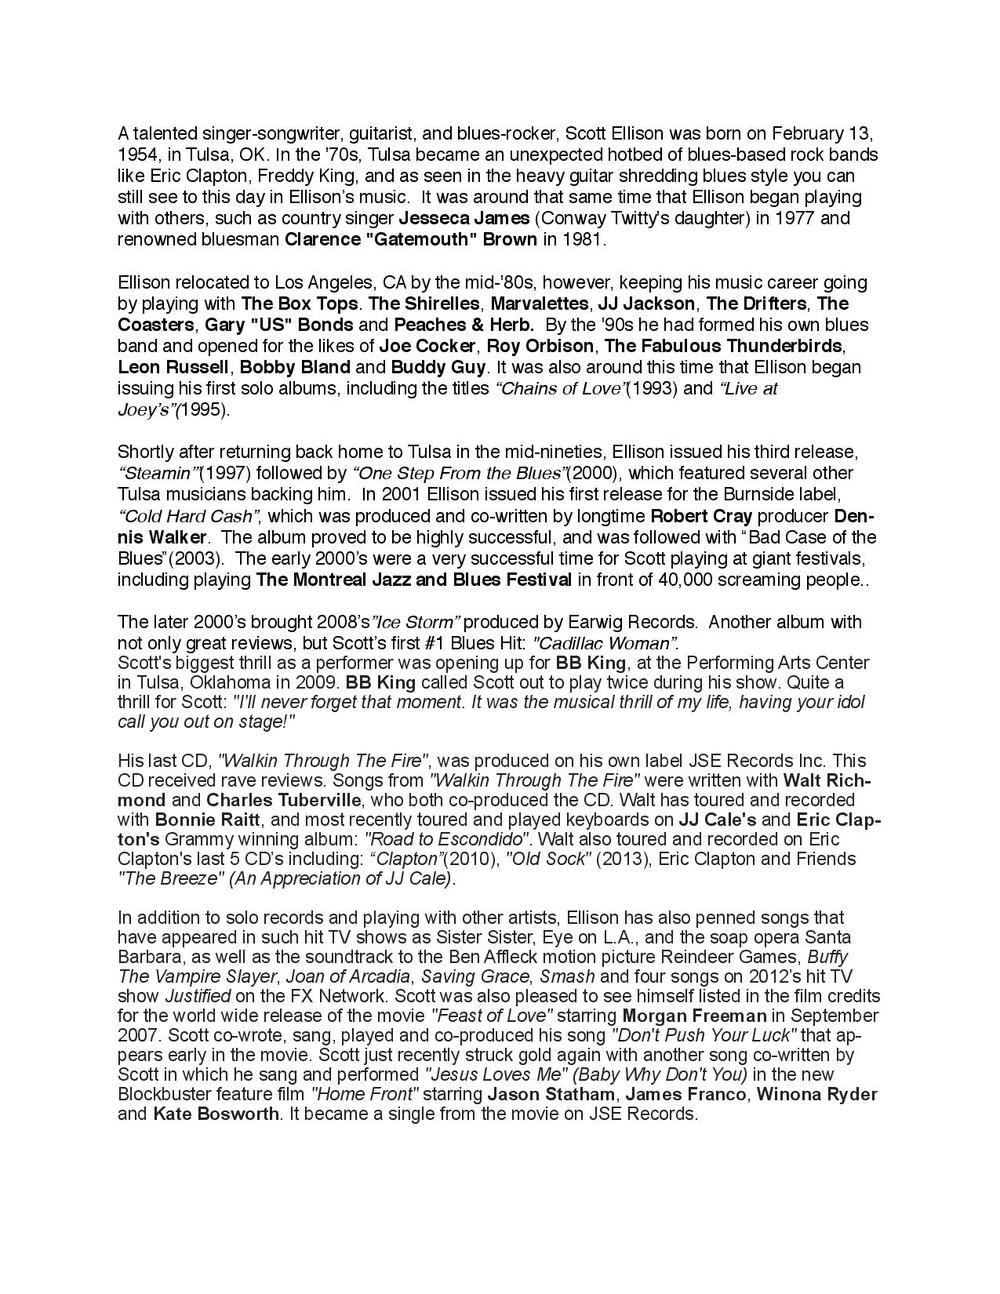 Scott Ellison Biography-page-001.jpg